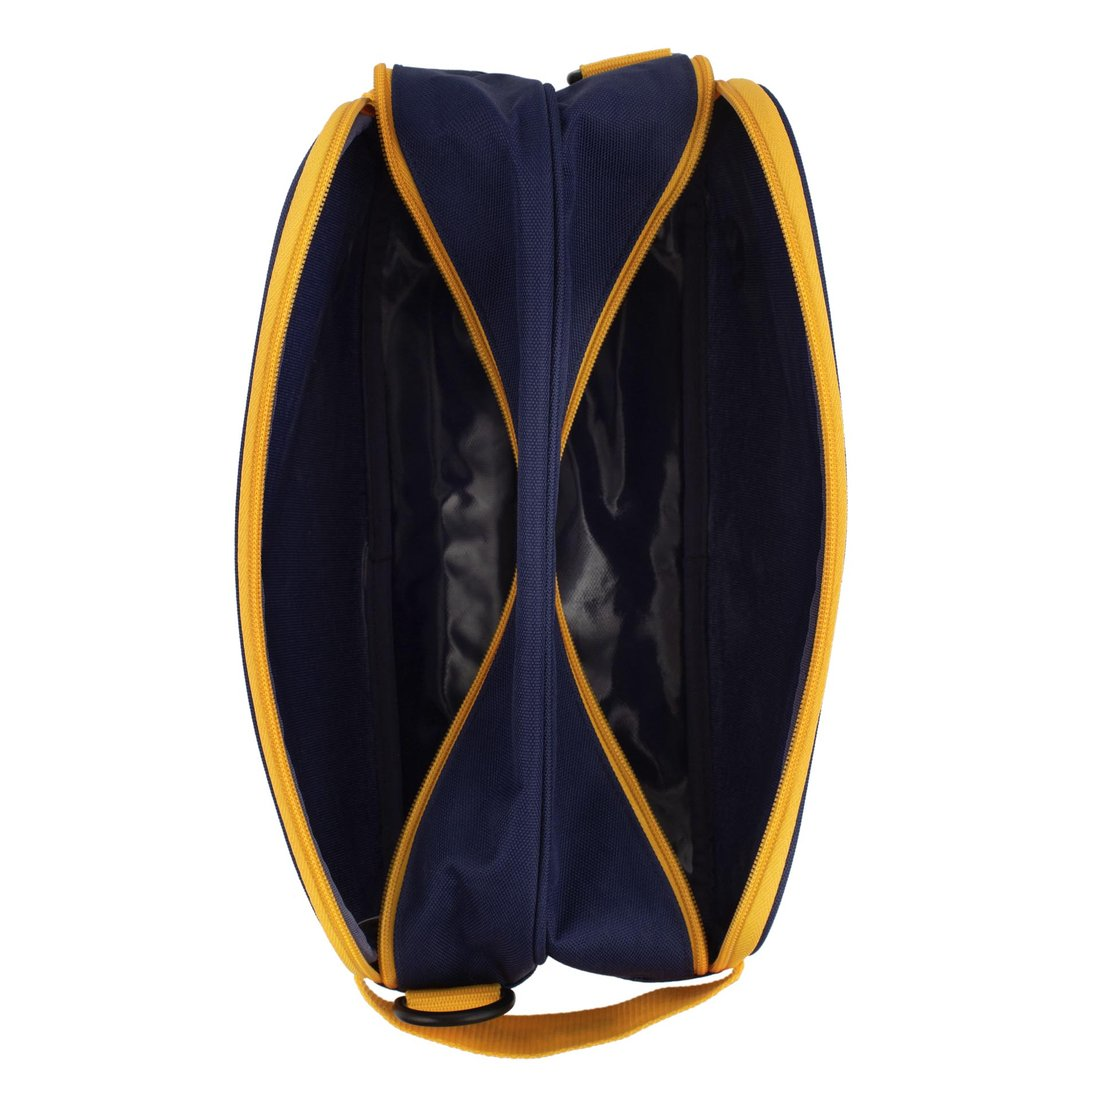 KAGS BRETT 系列超輕便雙分隔內裱膠鞋袋連揹帶 - 藍色